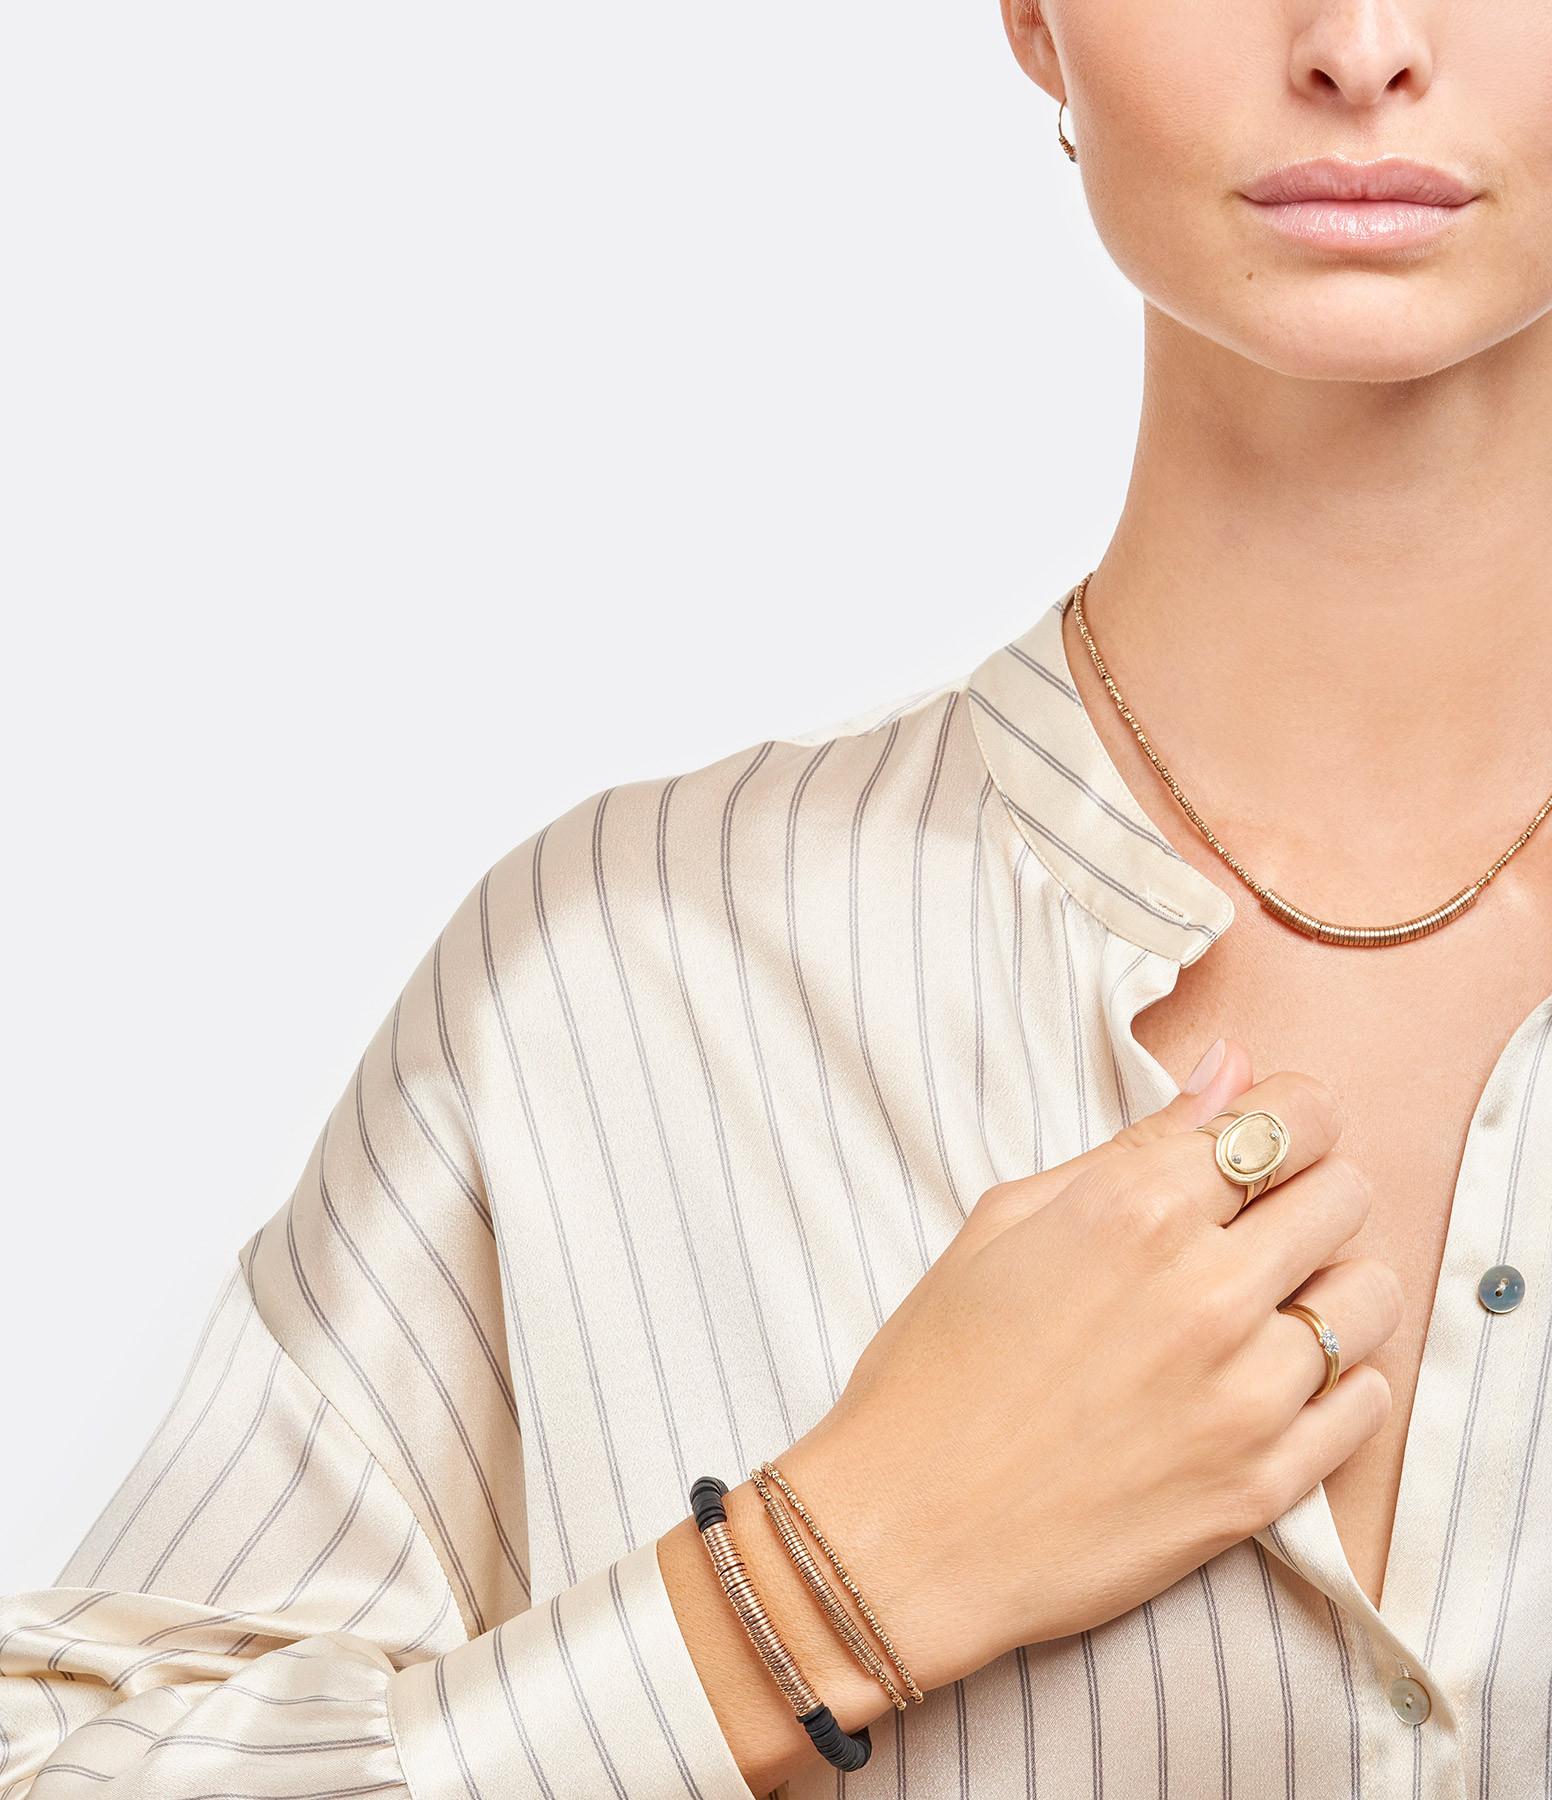 LSONGE - Bracelet Puka Chic XL Noir Rose